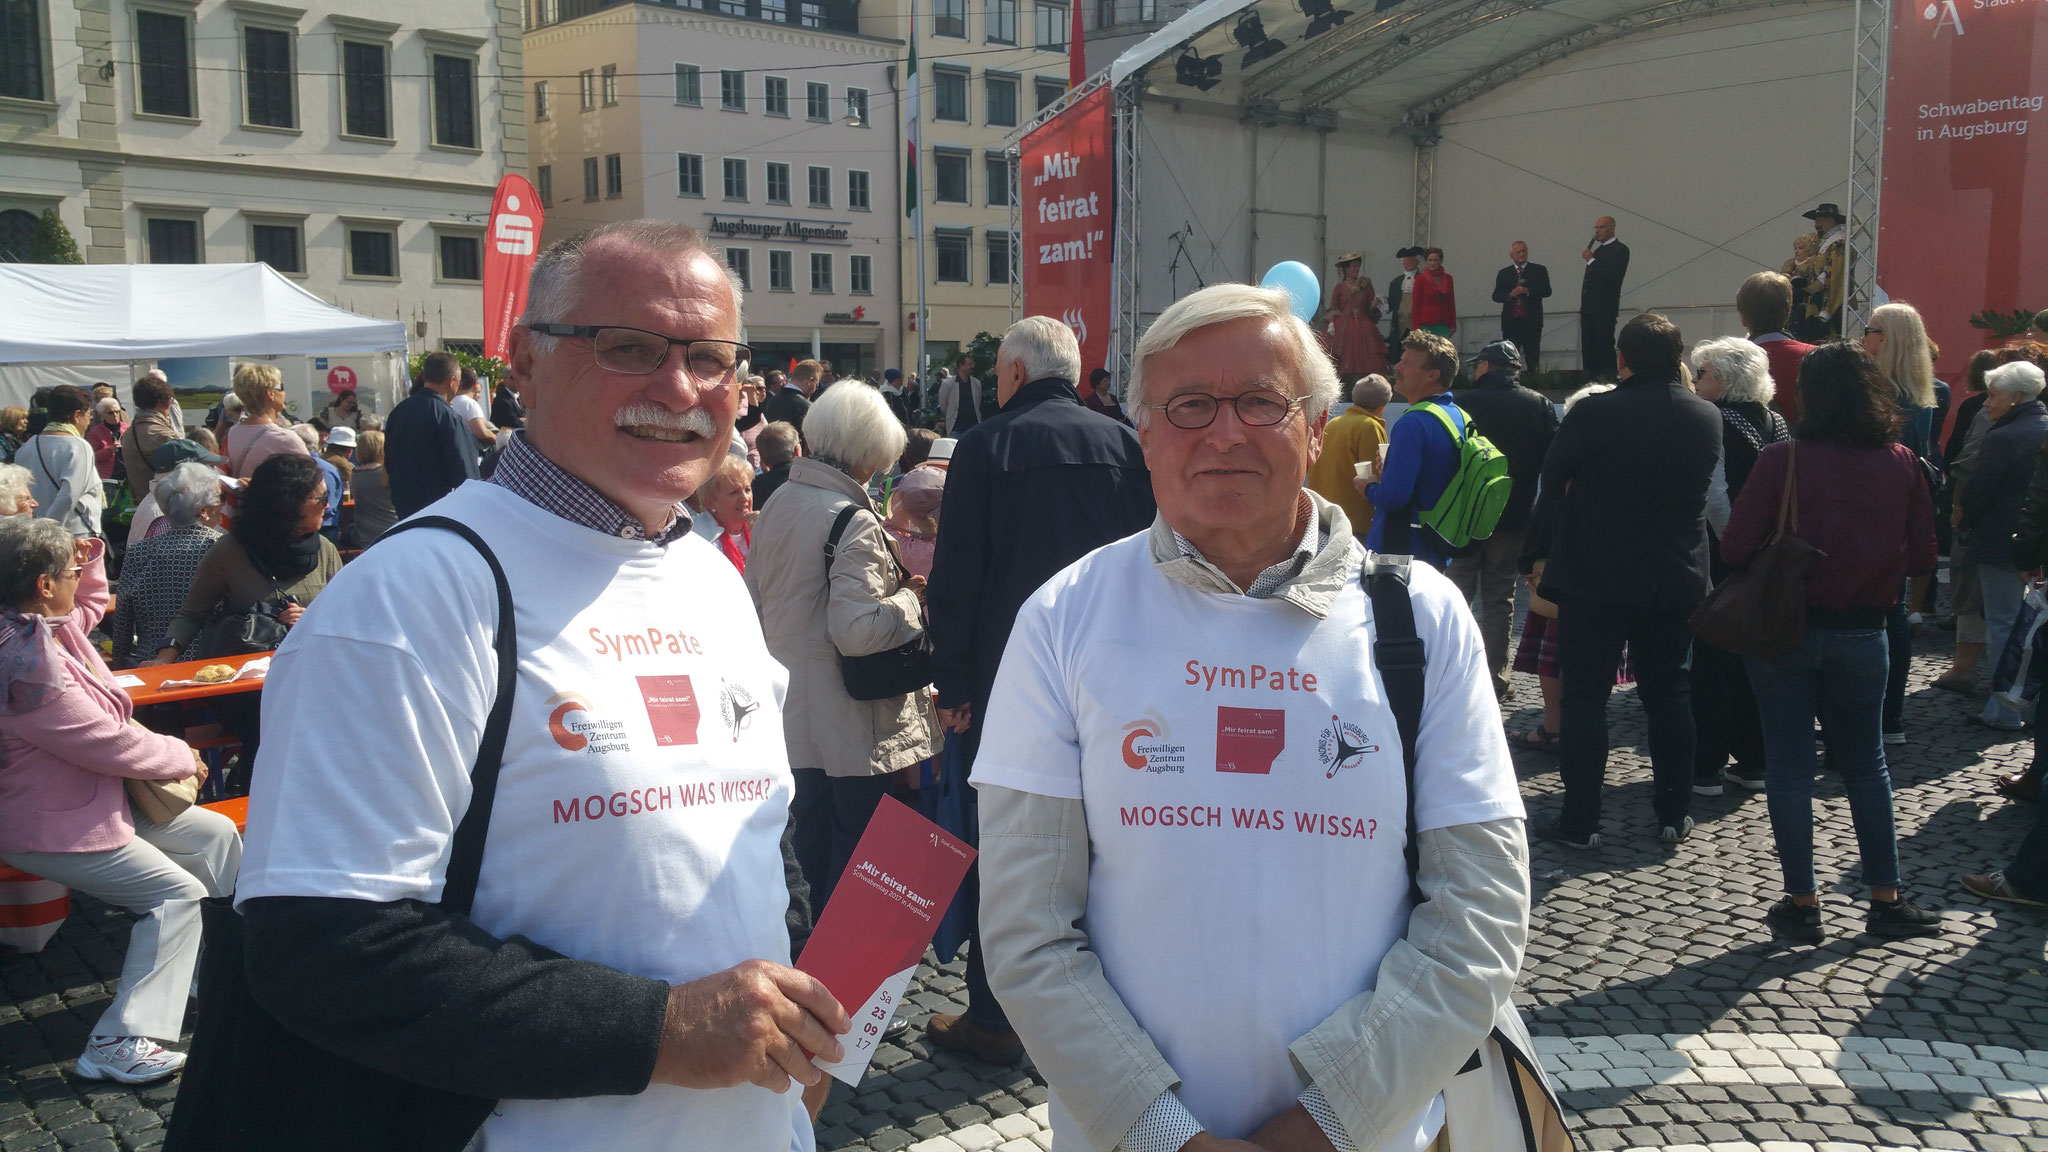 SymPaten - Schwabentag 2017 - Foto: Wolfgang F. Lightmaster - Freiwilligen-Zentrum Augsburg